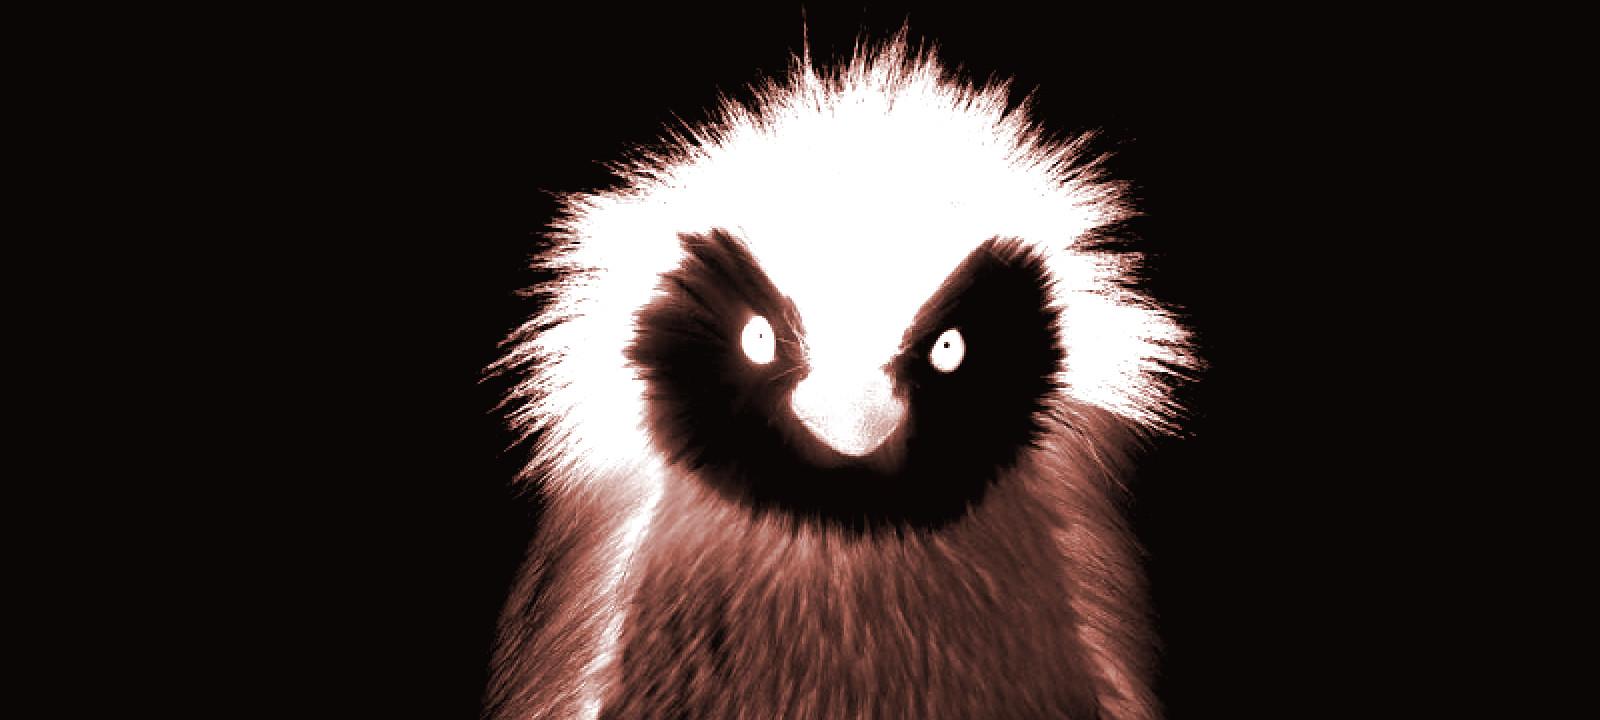 Распуши пингвина! Разбираем способы фаззинга ядра Linux